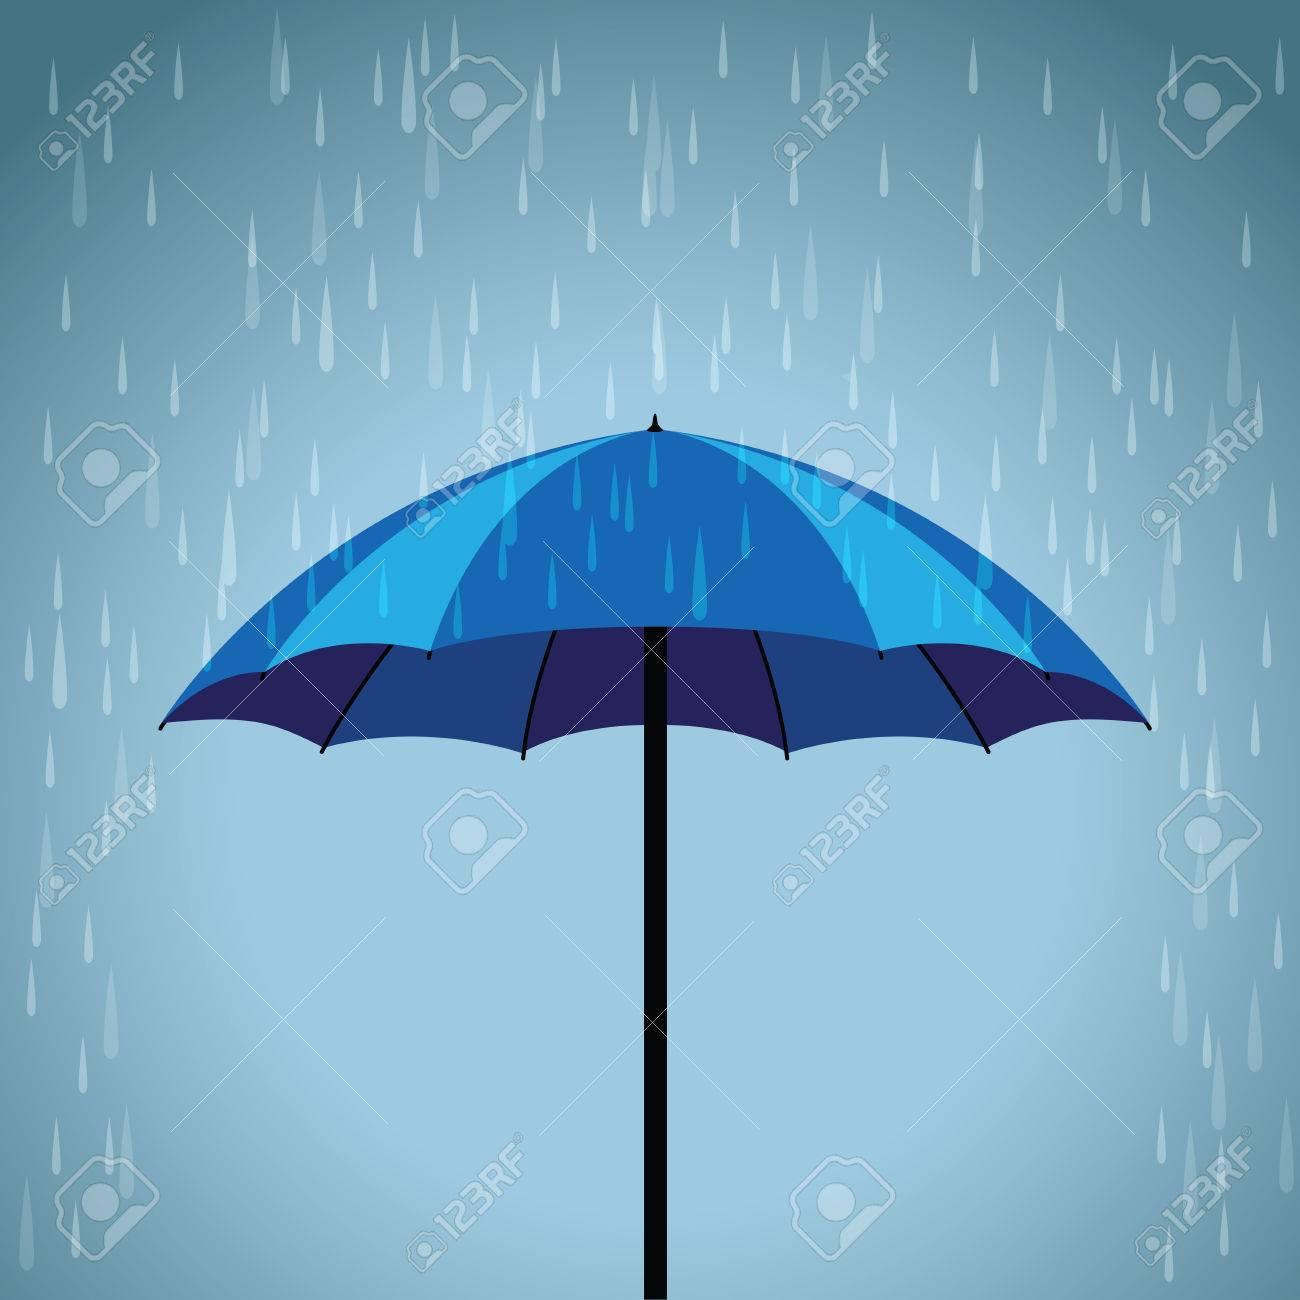 blue umbrella rain background royalty free cliparts vectors and